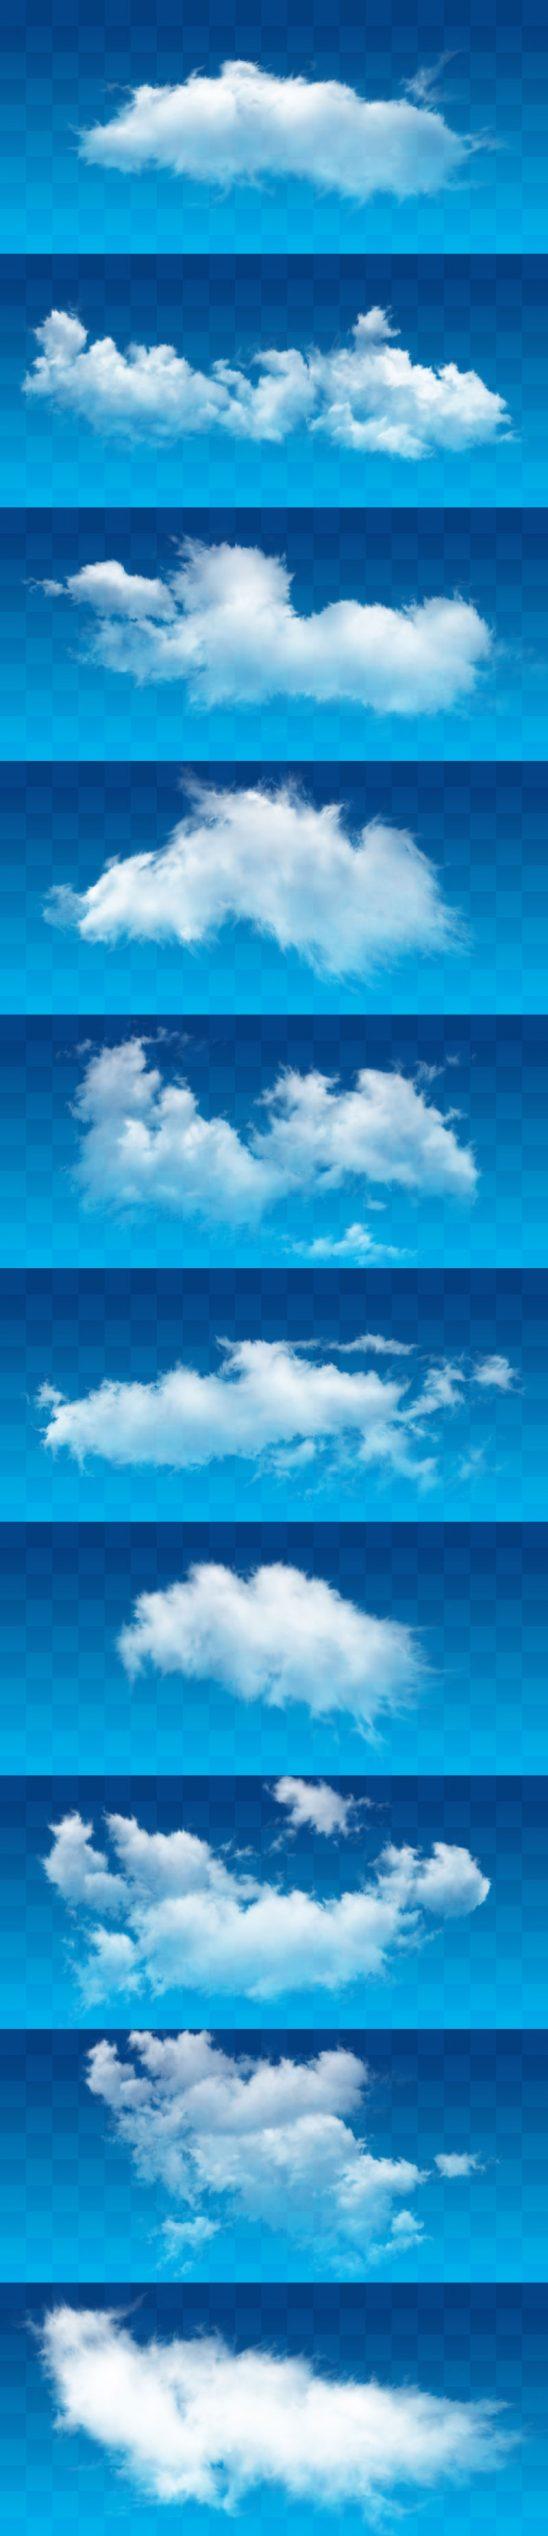 p163 548x2536 - لایه باز دوربری ابر آسمان